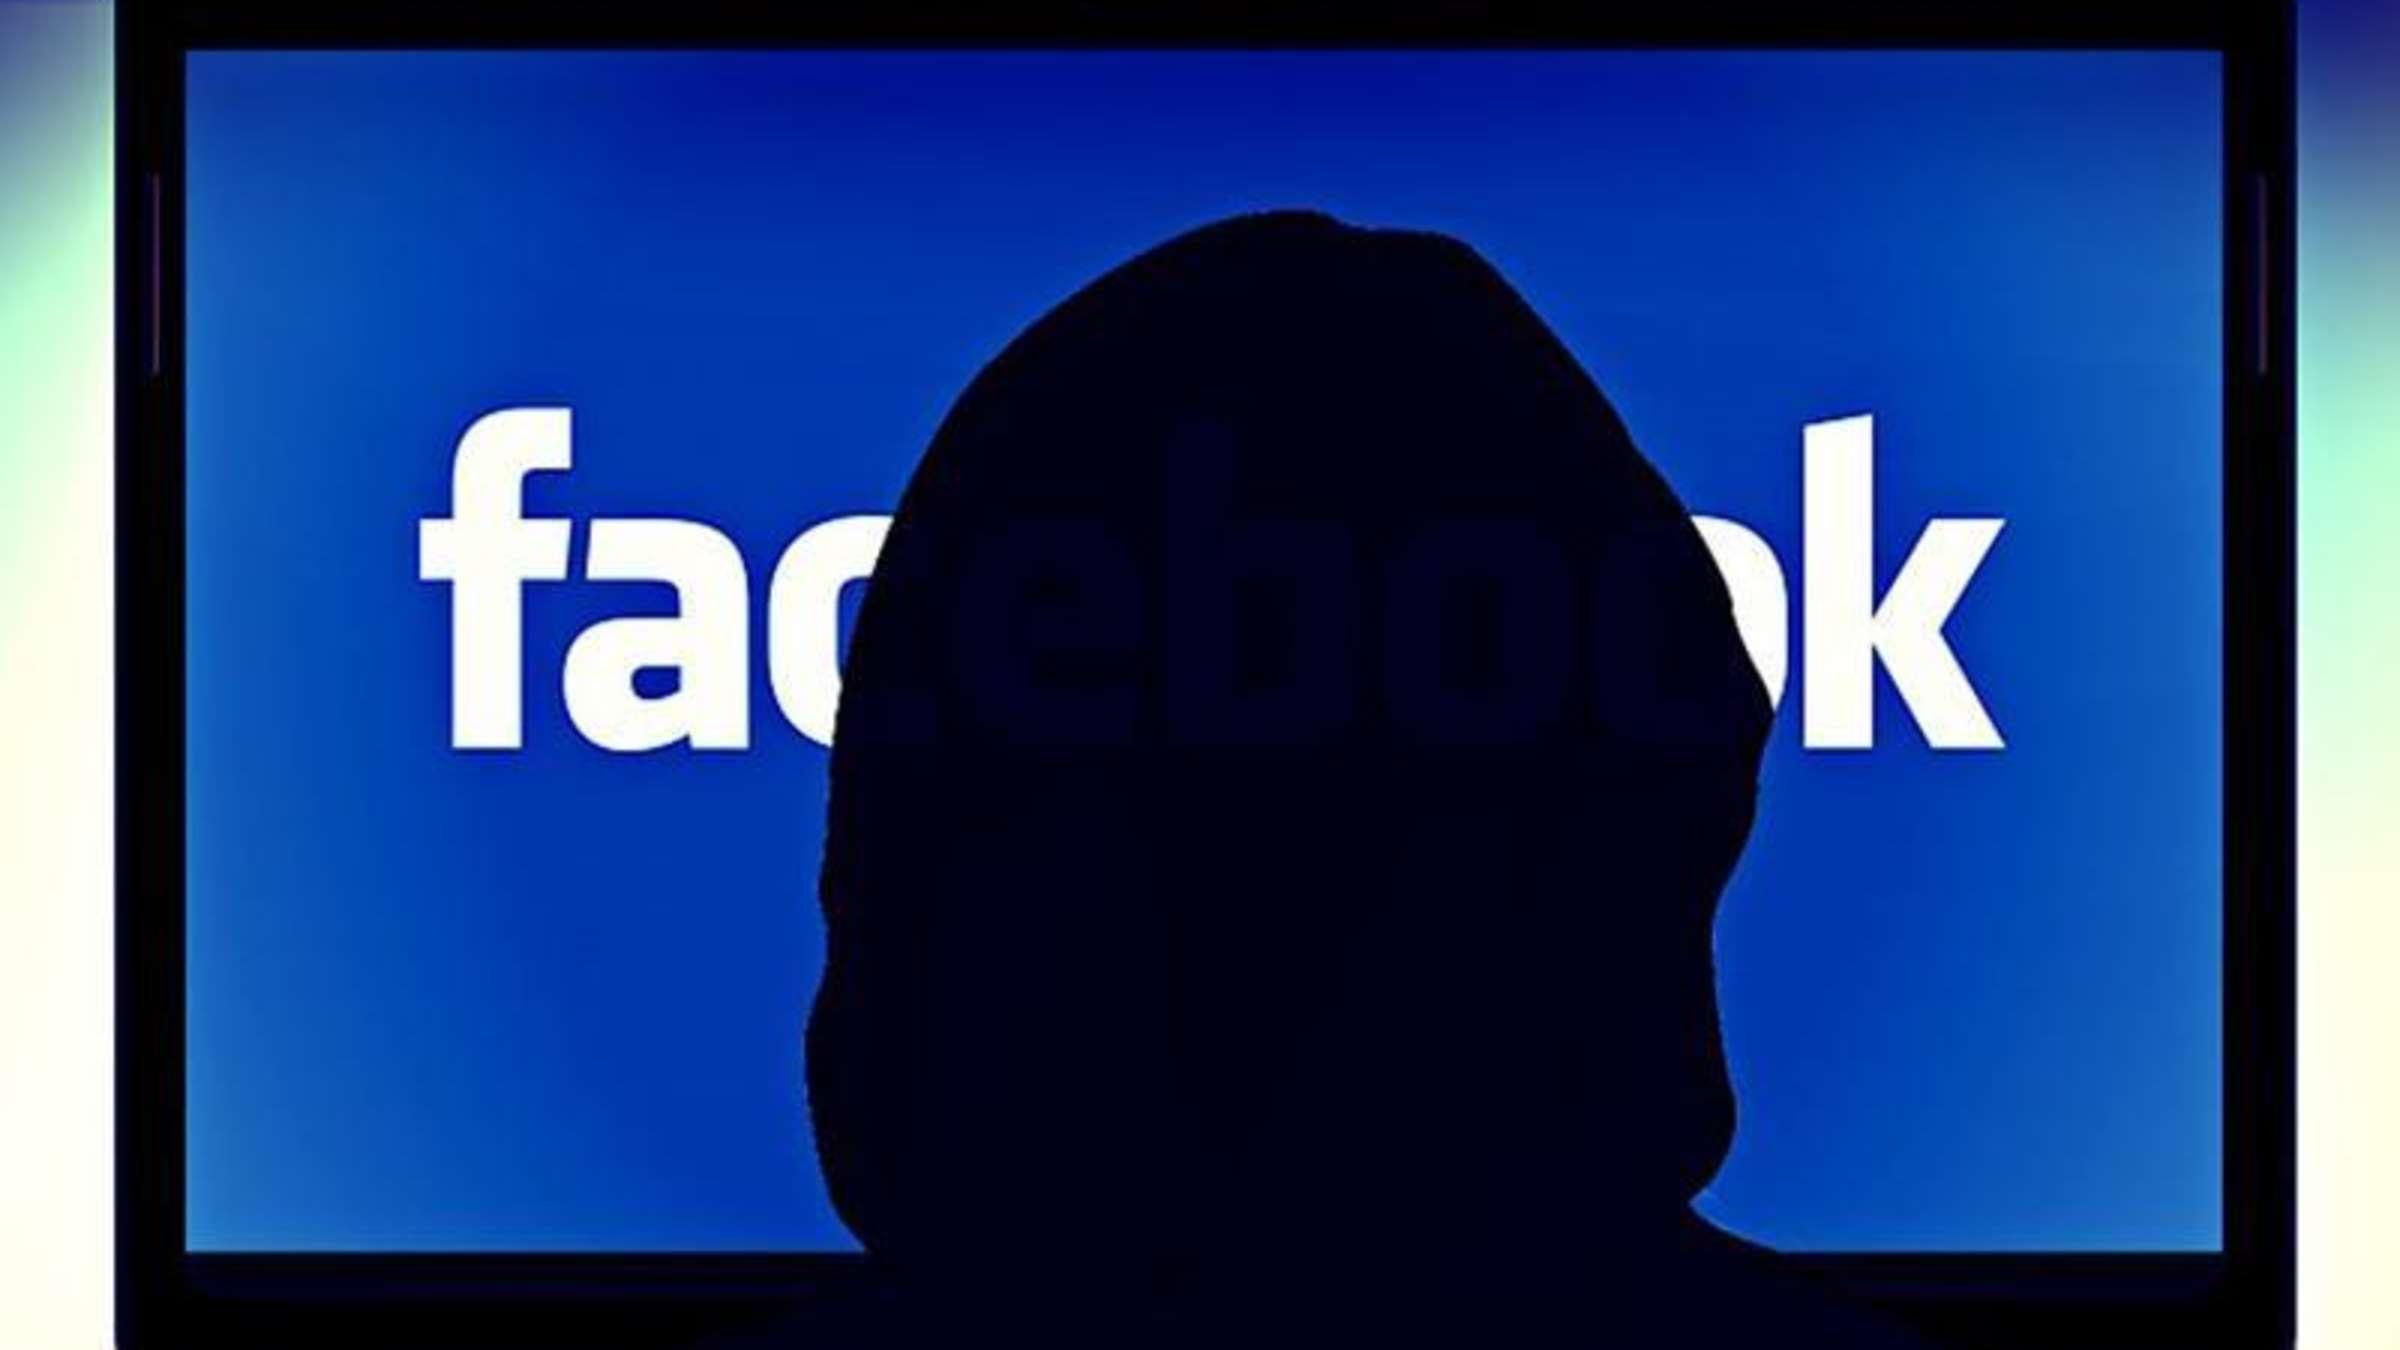 Facebook eigenes profil ansehen